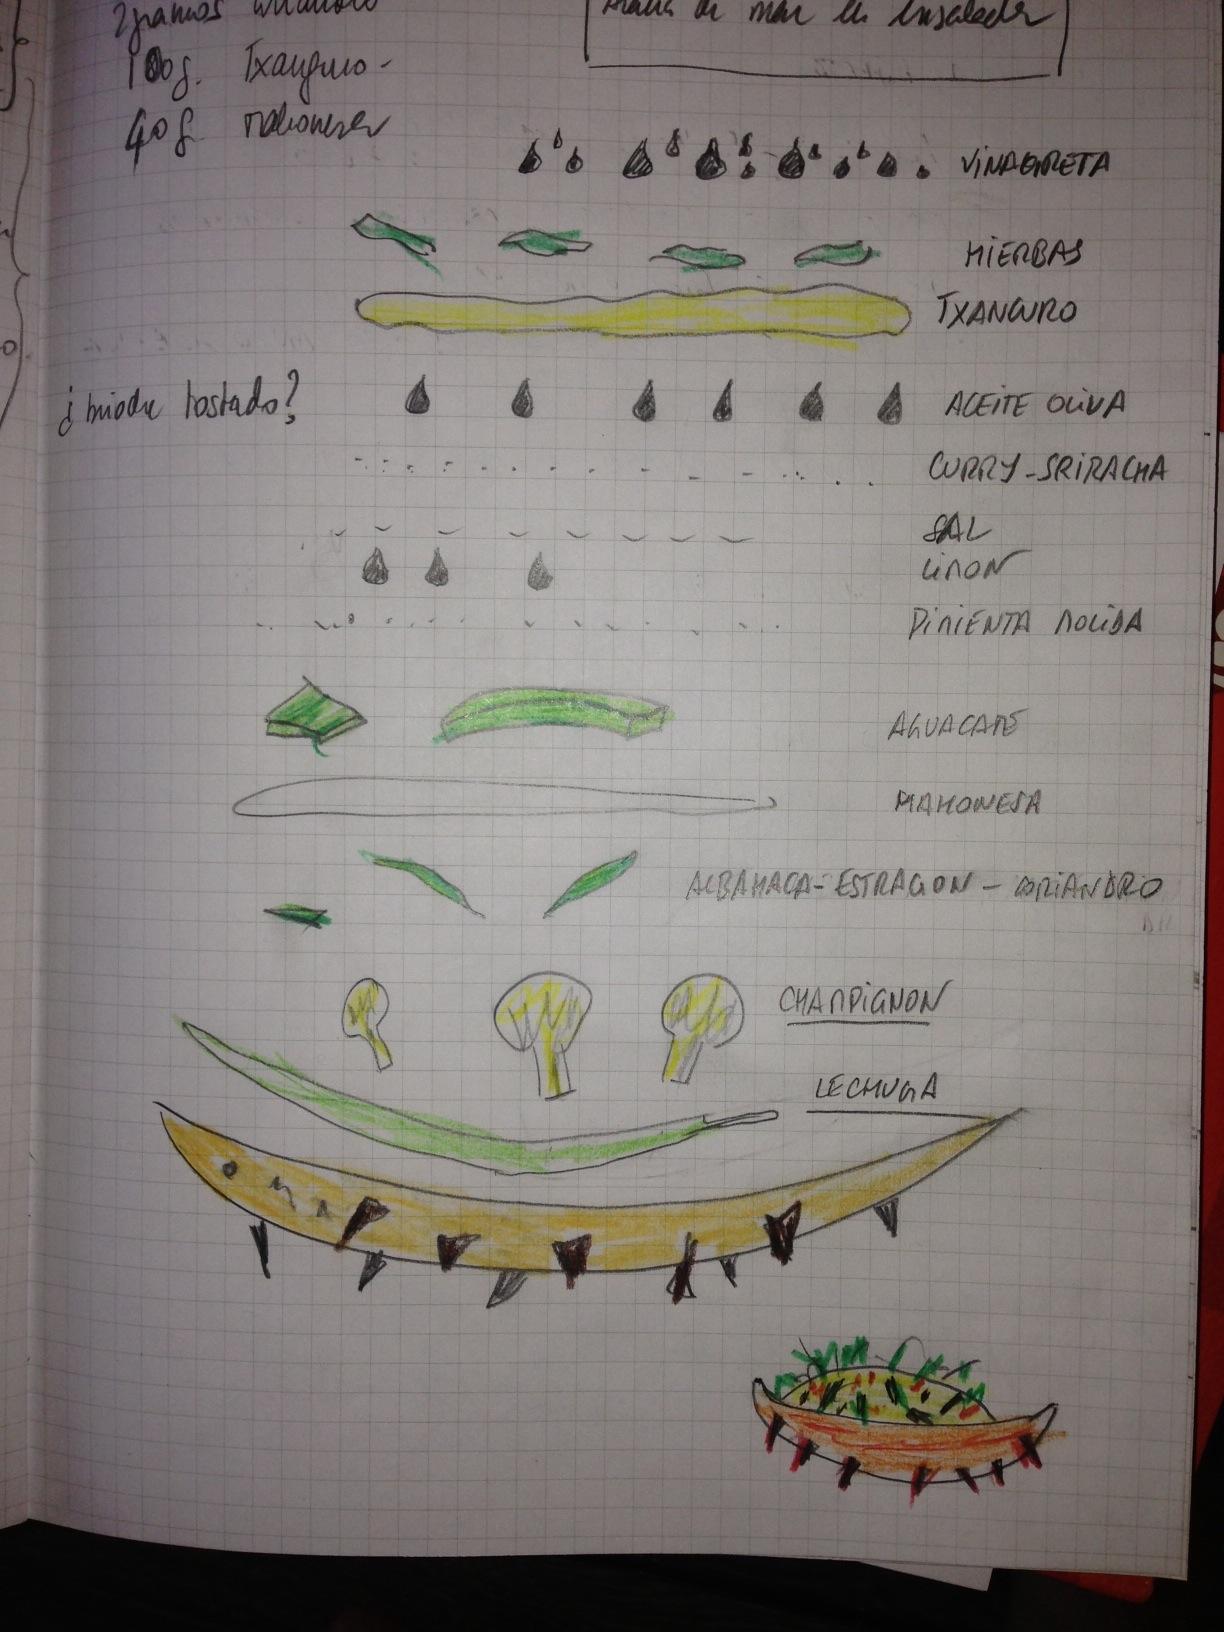 Cuerpo maduro cuerpo verde - 1 3